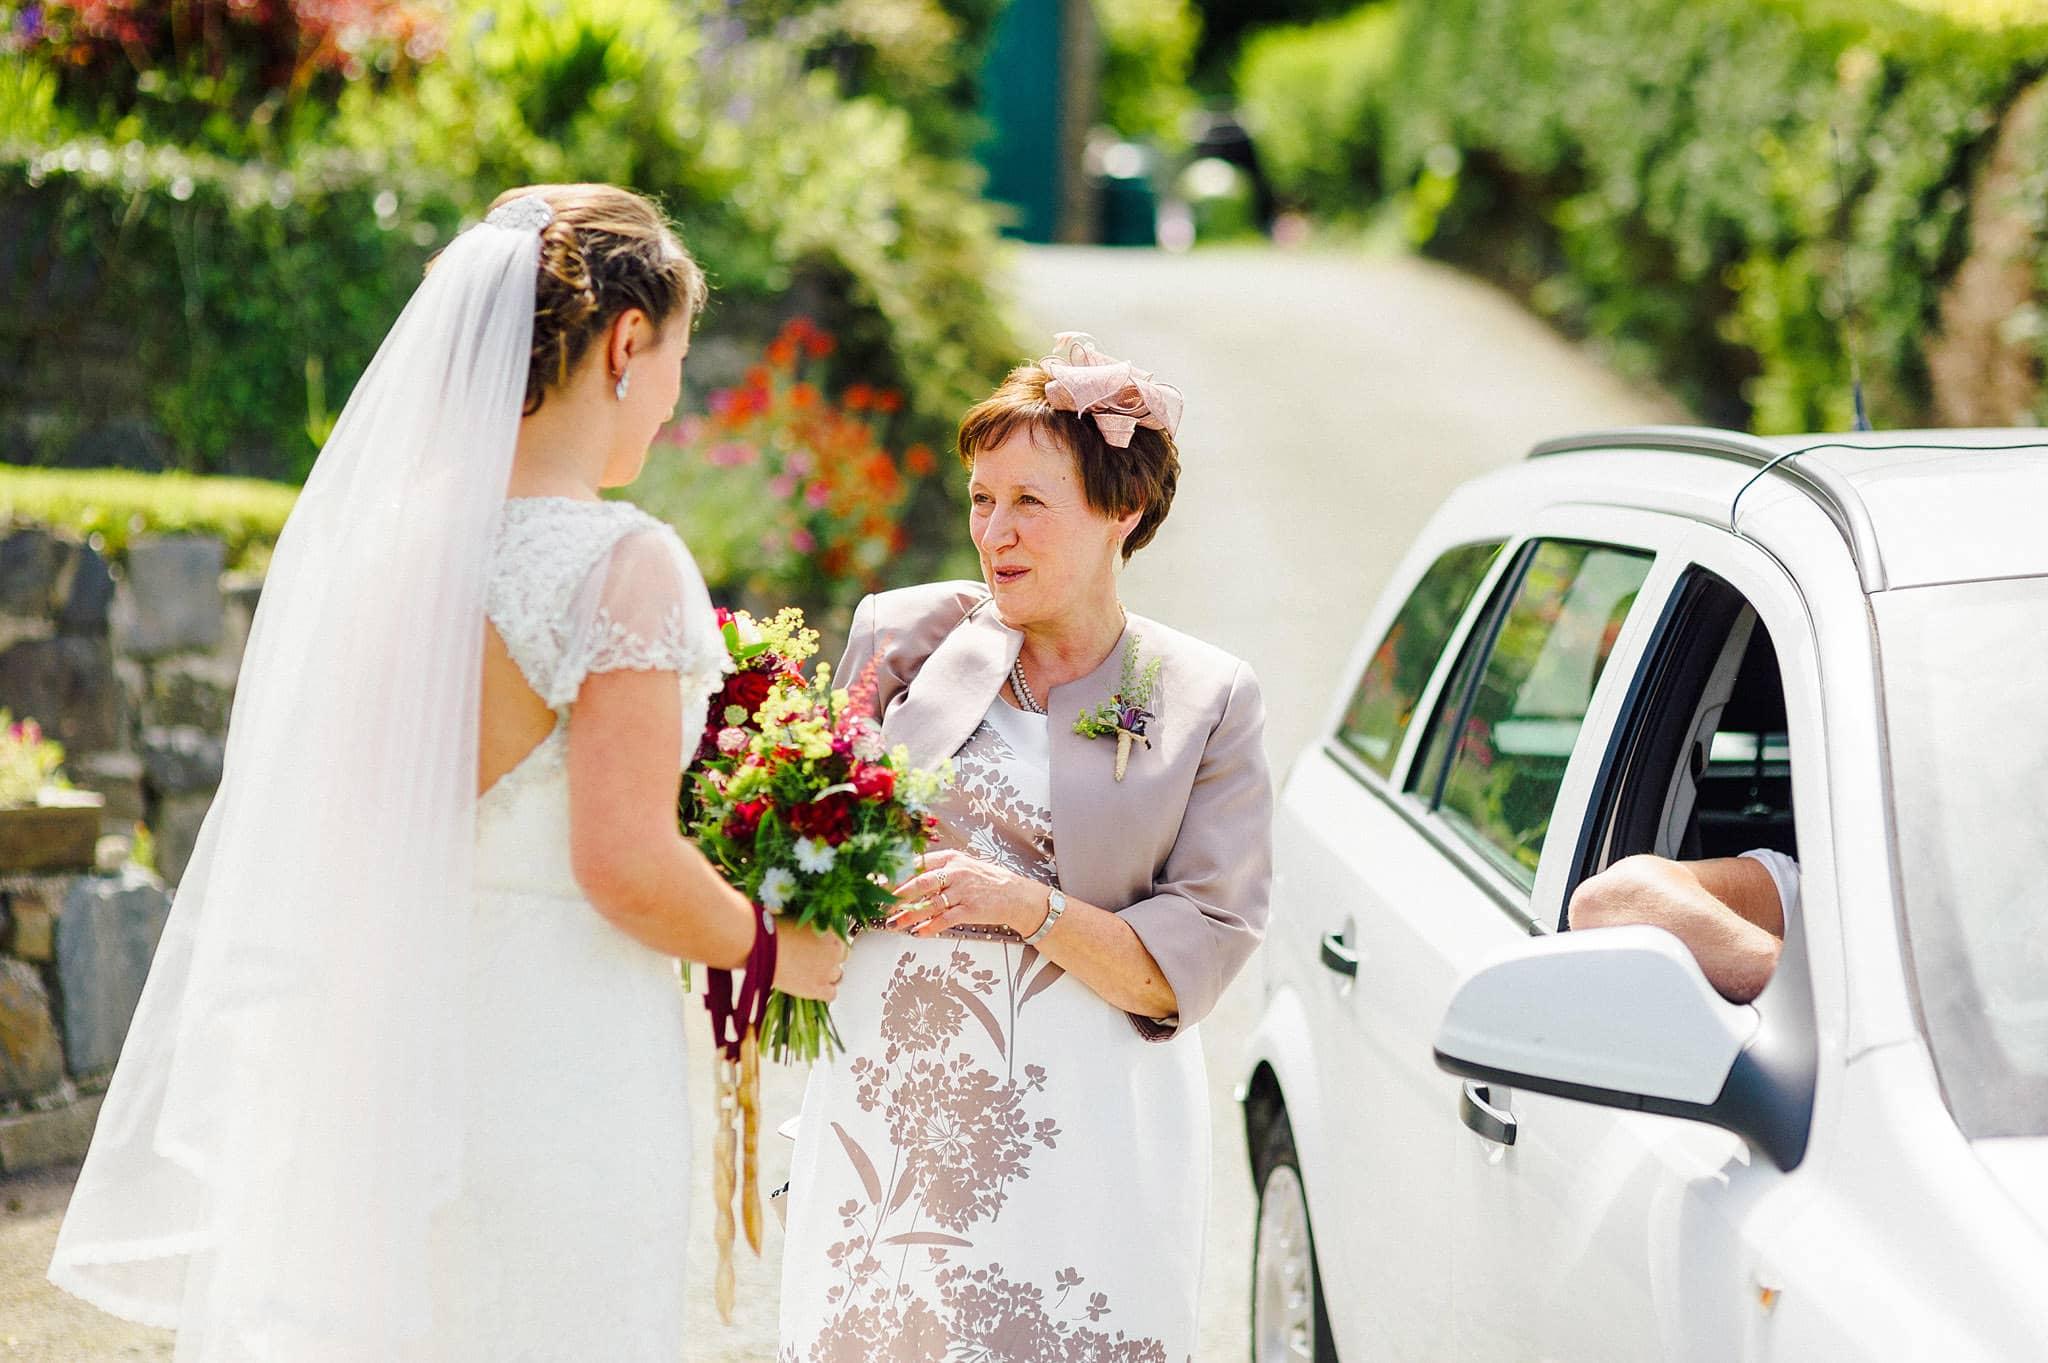 wedding-photographer-aberystwyth-wales (26)